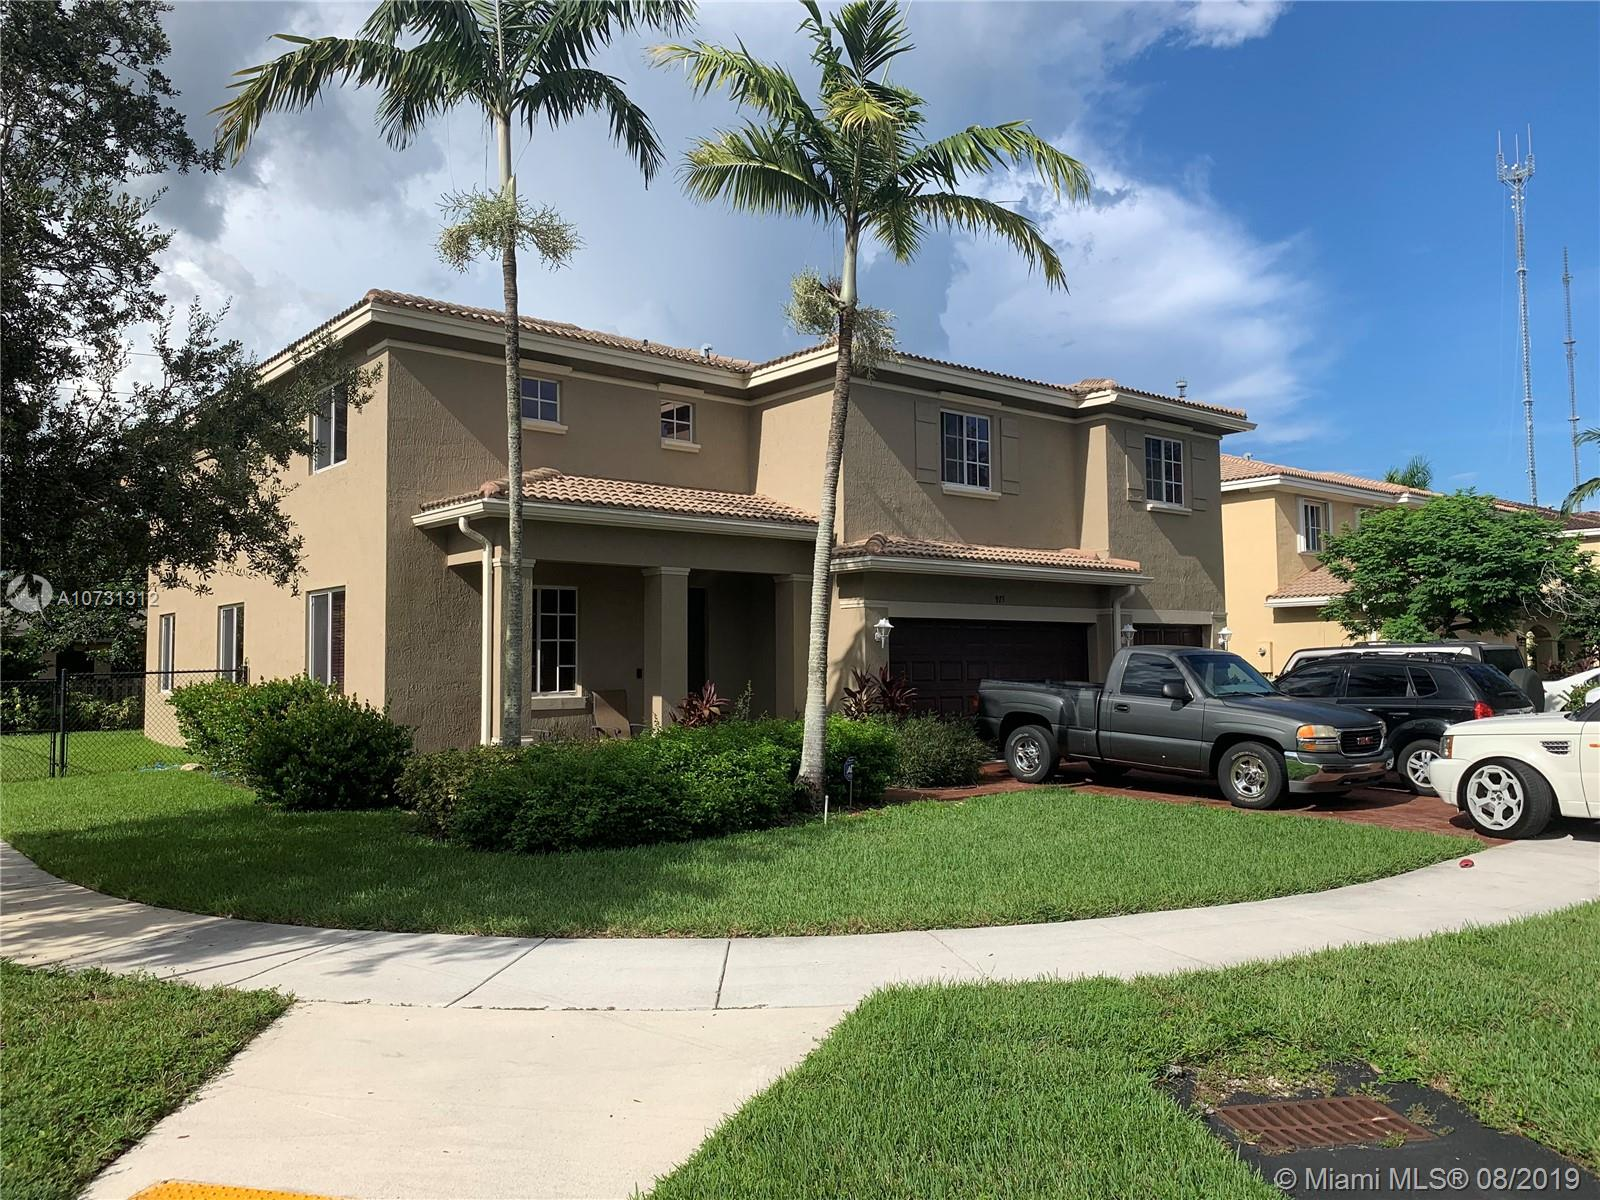 973 NW 206th Ter, Miami Gardens, FL 33169